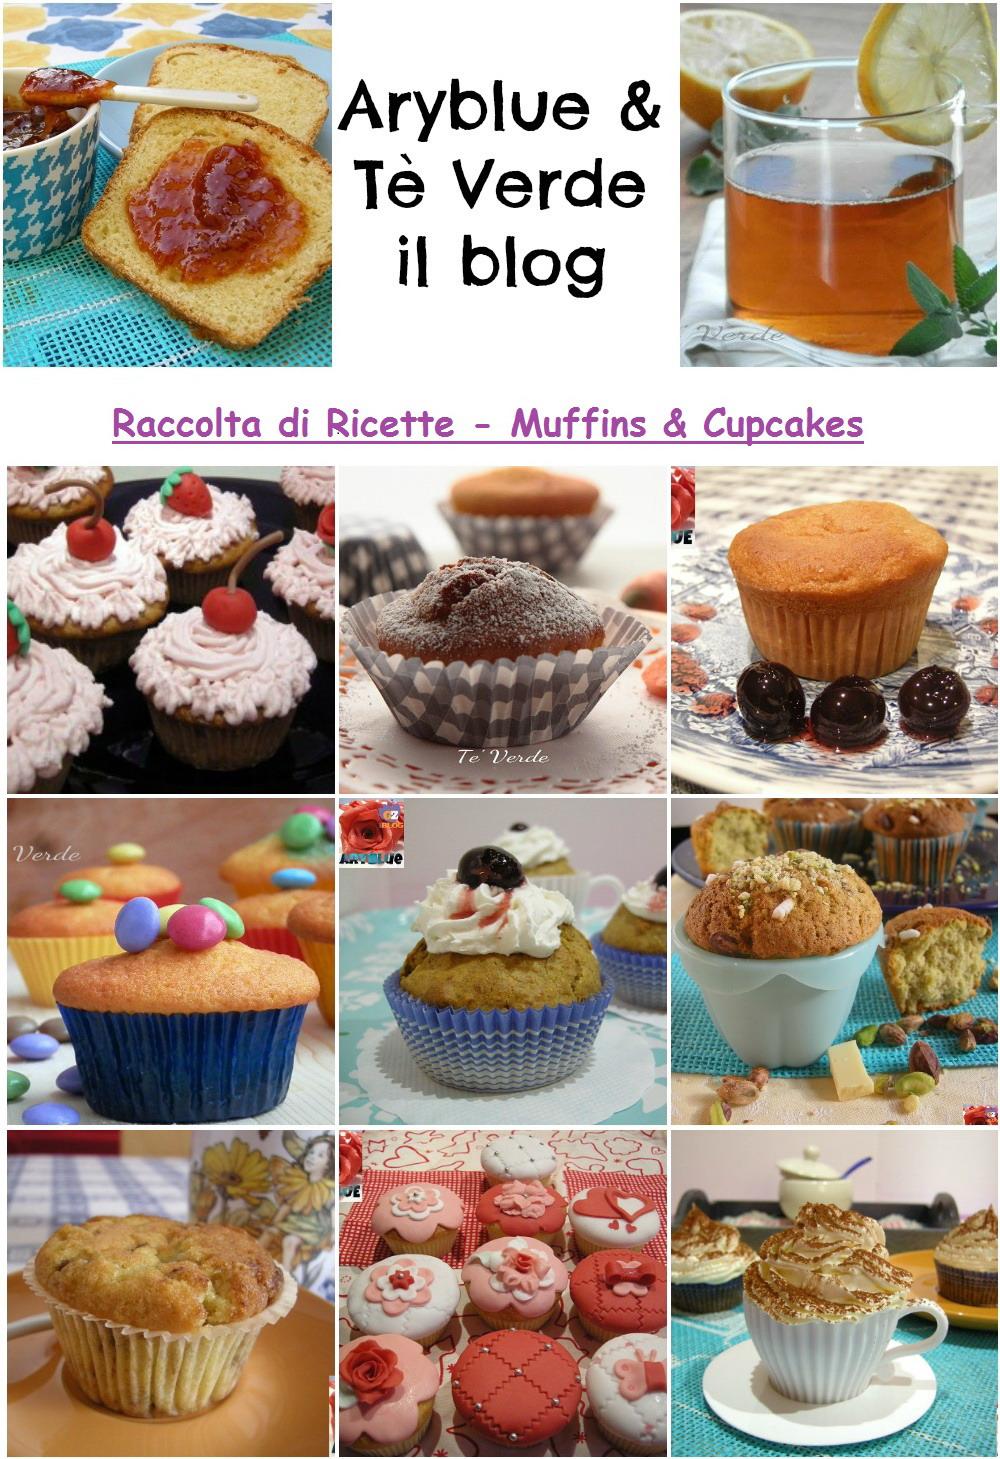 Raccolta di Ricette - Muffins e Cupcakes